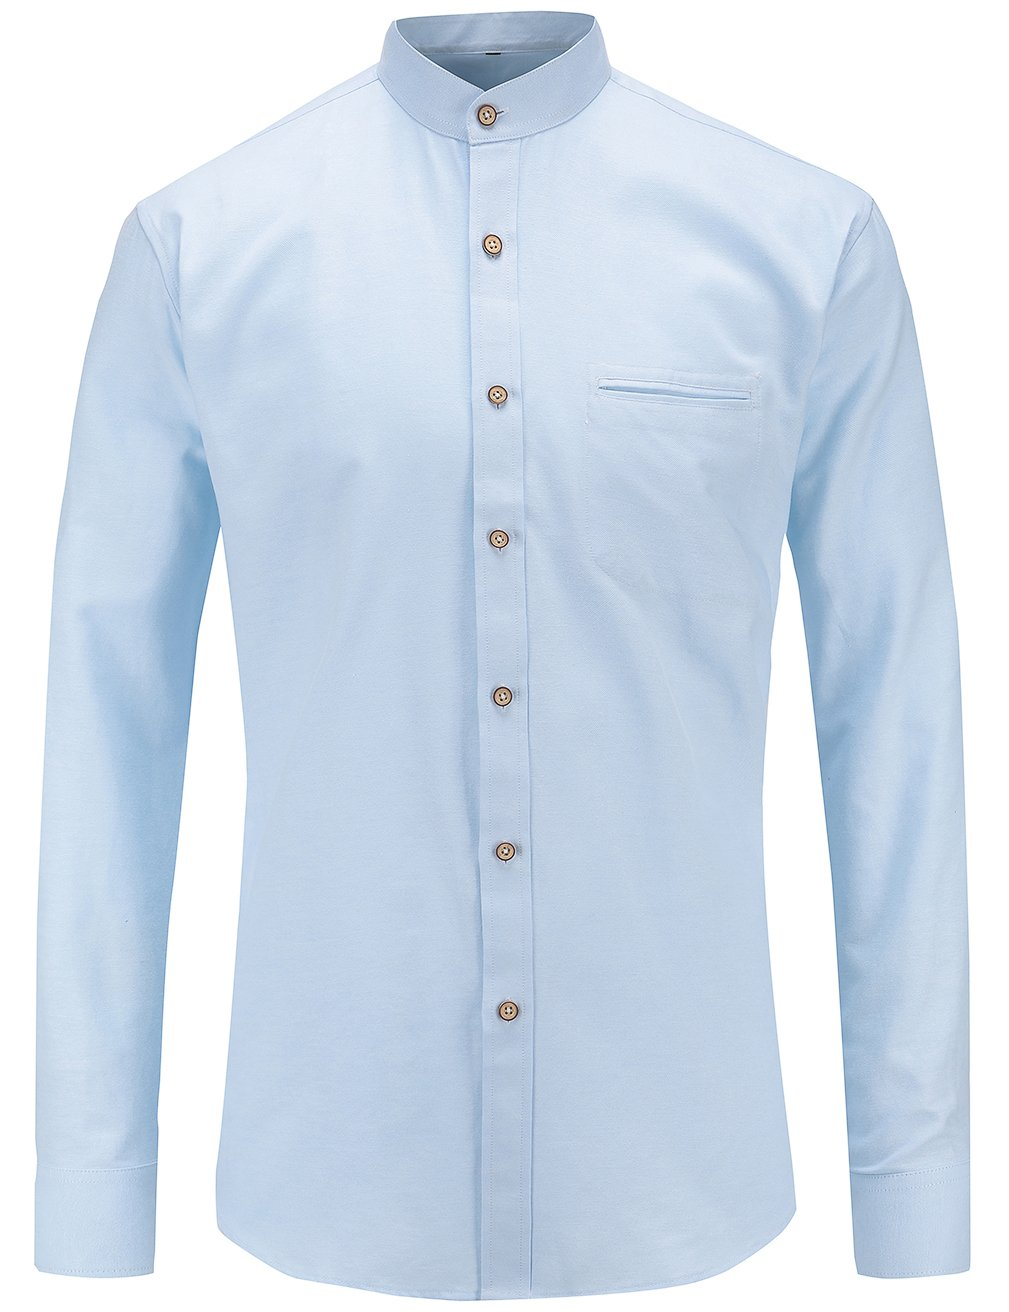 49b208f26f0 JEETOO Mens Grandad Collar Oxford Shirt Long Sleeve Solid Color